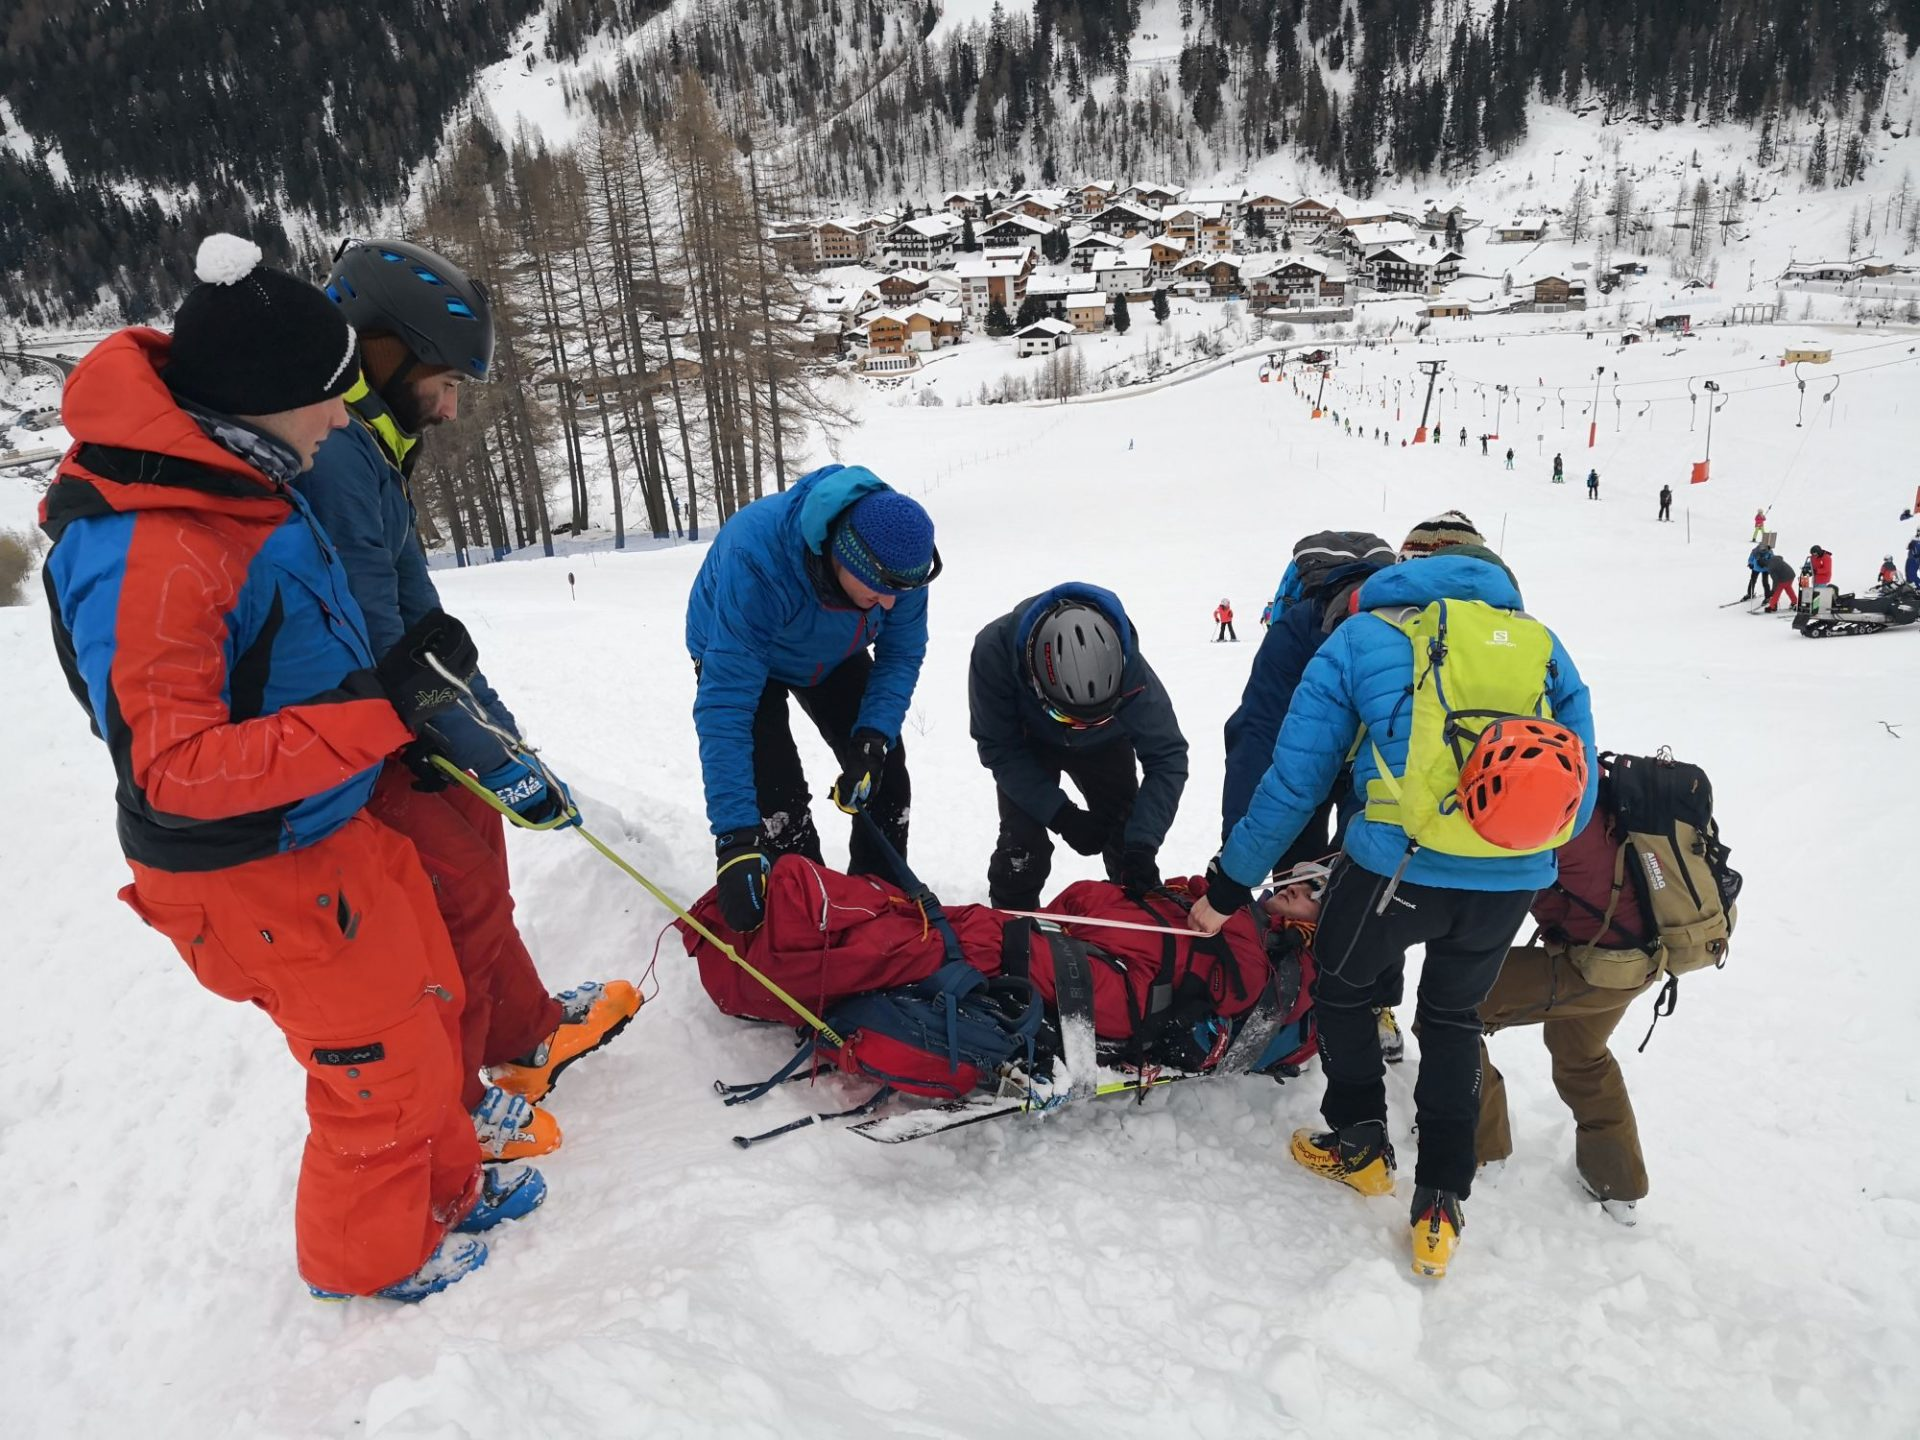 Bergsteigertipp: Skischlitten & Biwacksack-Verschnürung